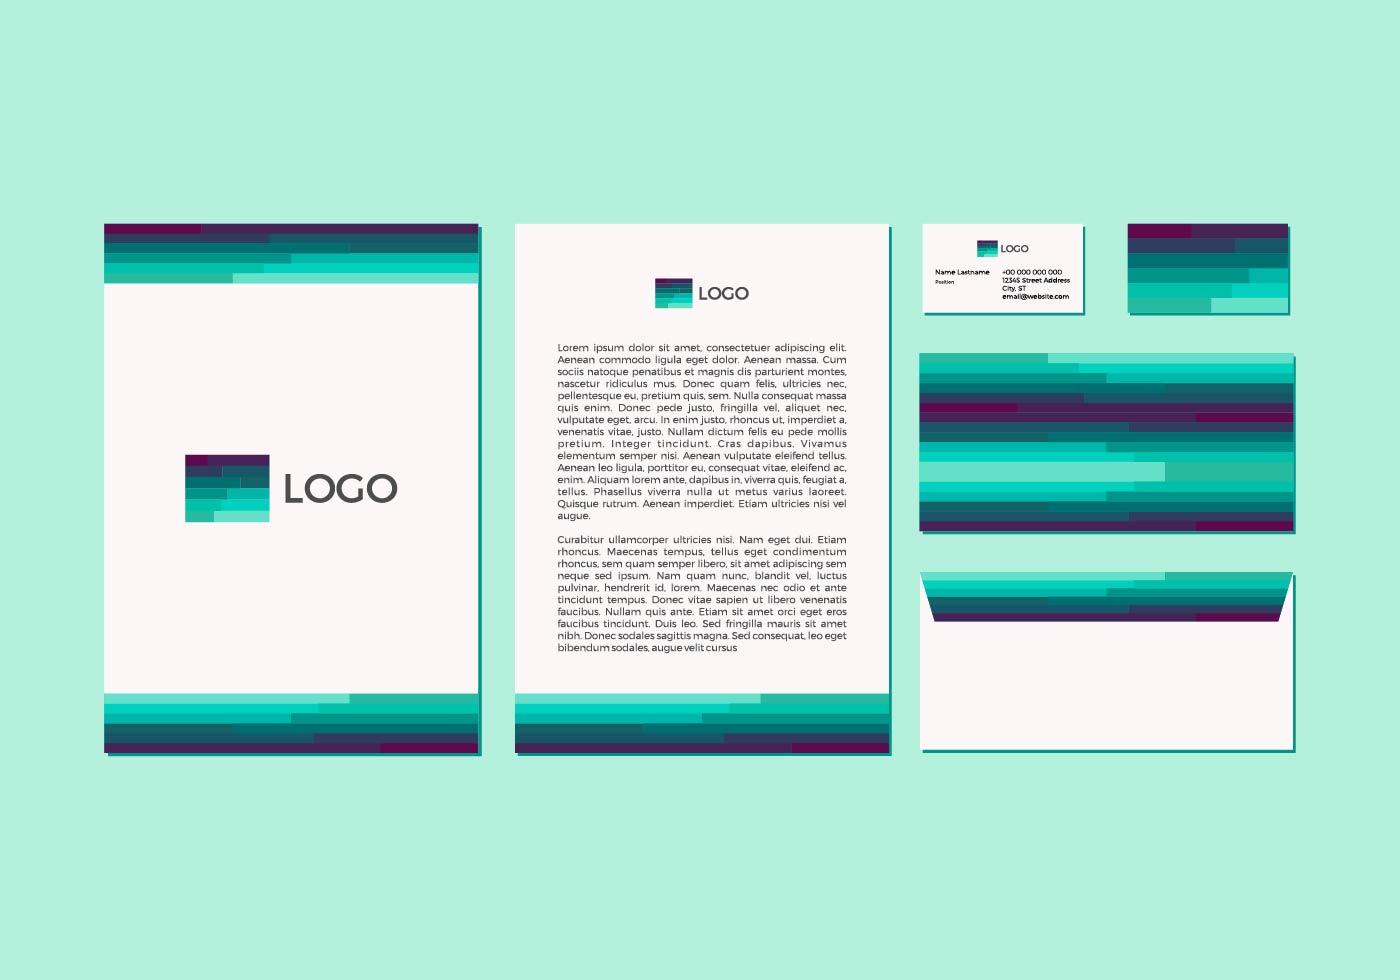 Free Emerald Vector Letterhead Design Download Free Vector Art Stock Graphics Amp Images